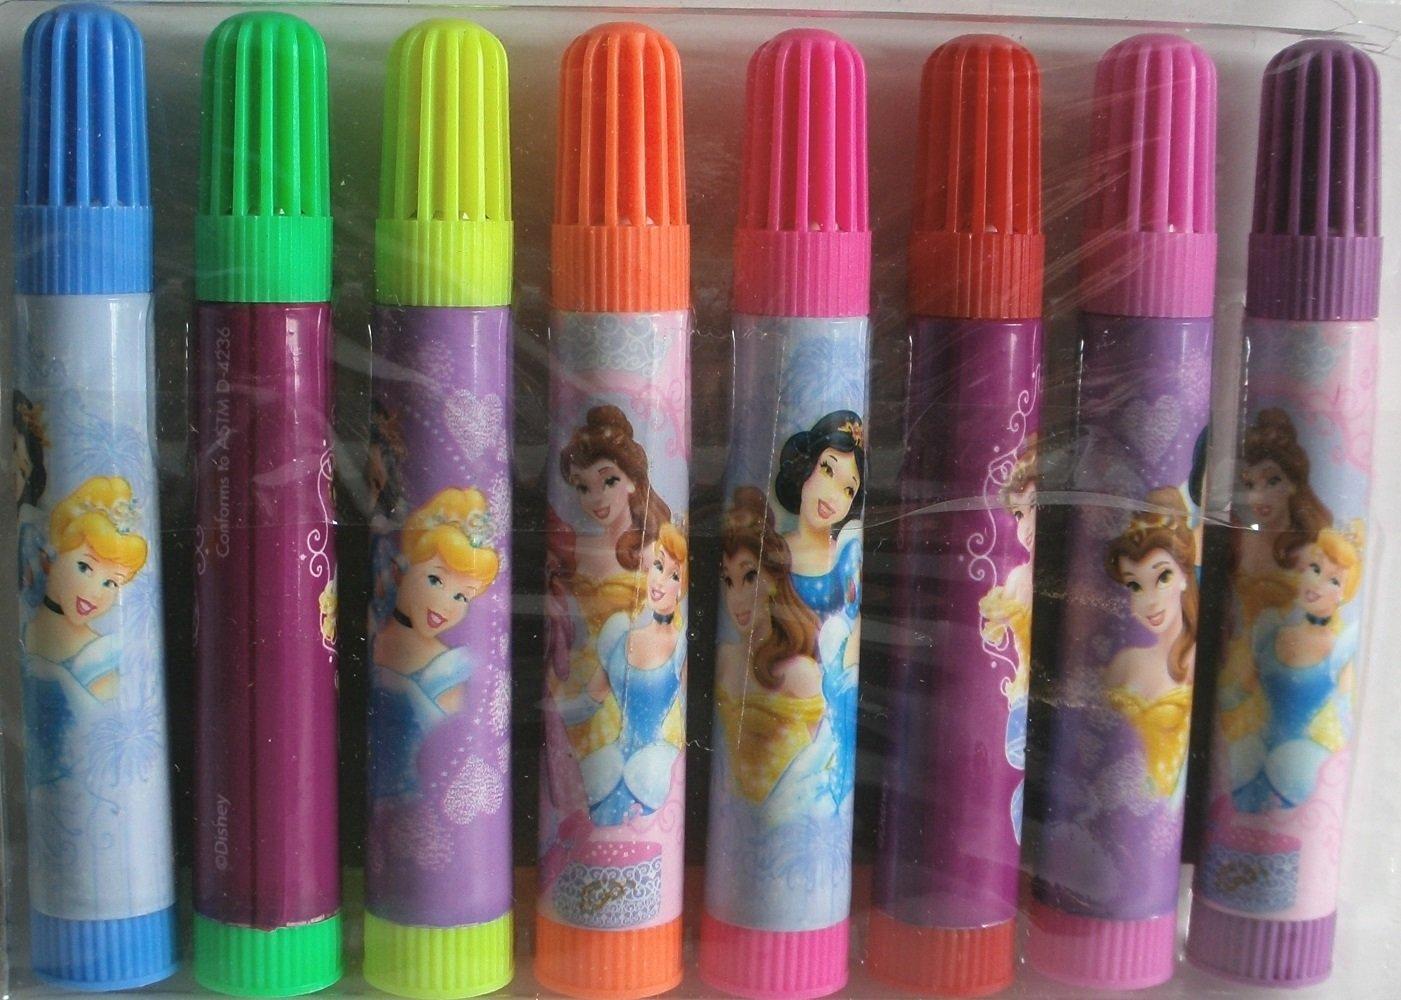 Disney Princess Stationery Marker Set, Pack of 8